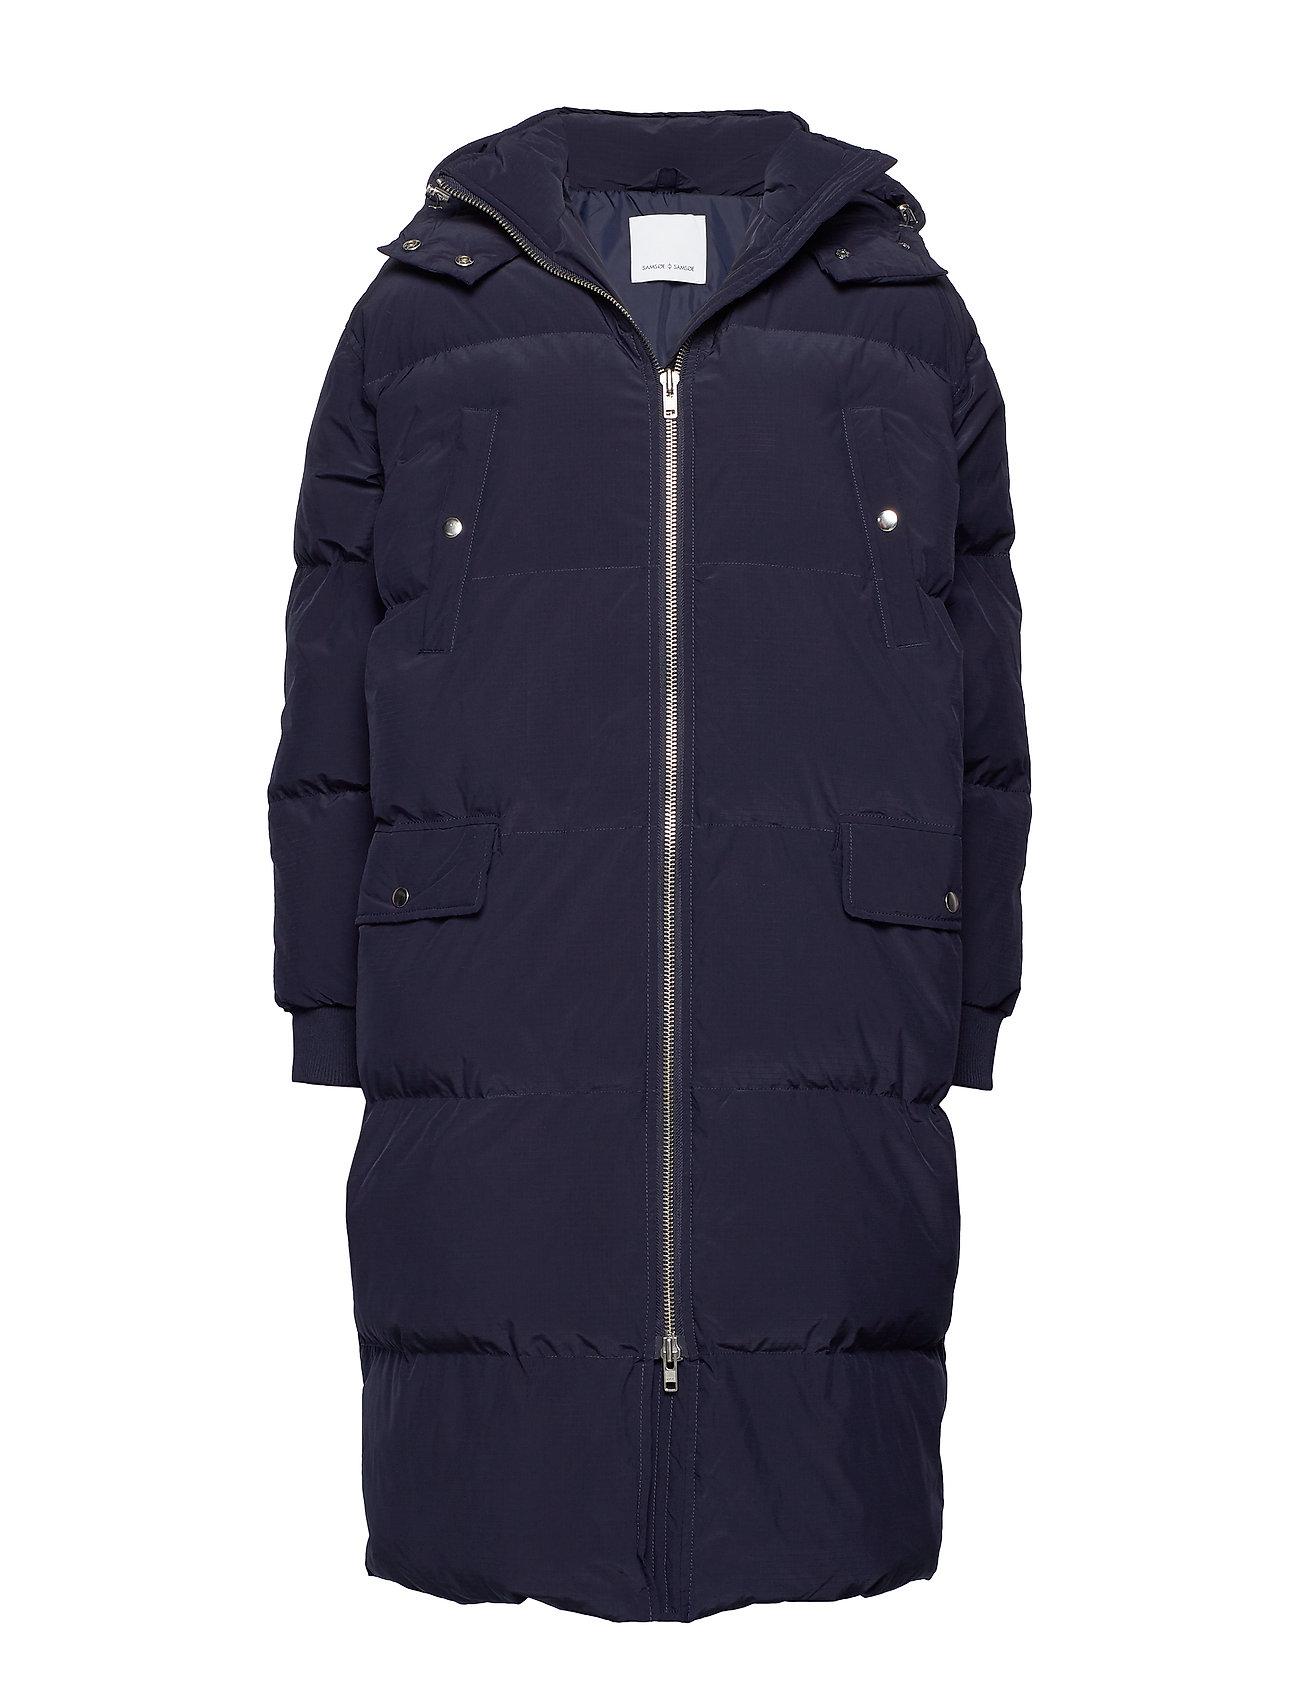 Samsøe & Samsøe Madge jacket 8276 - NIGHT SKY